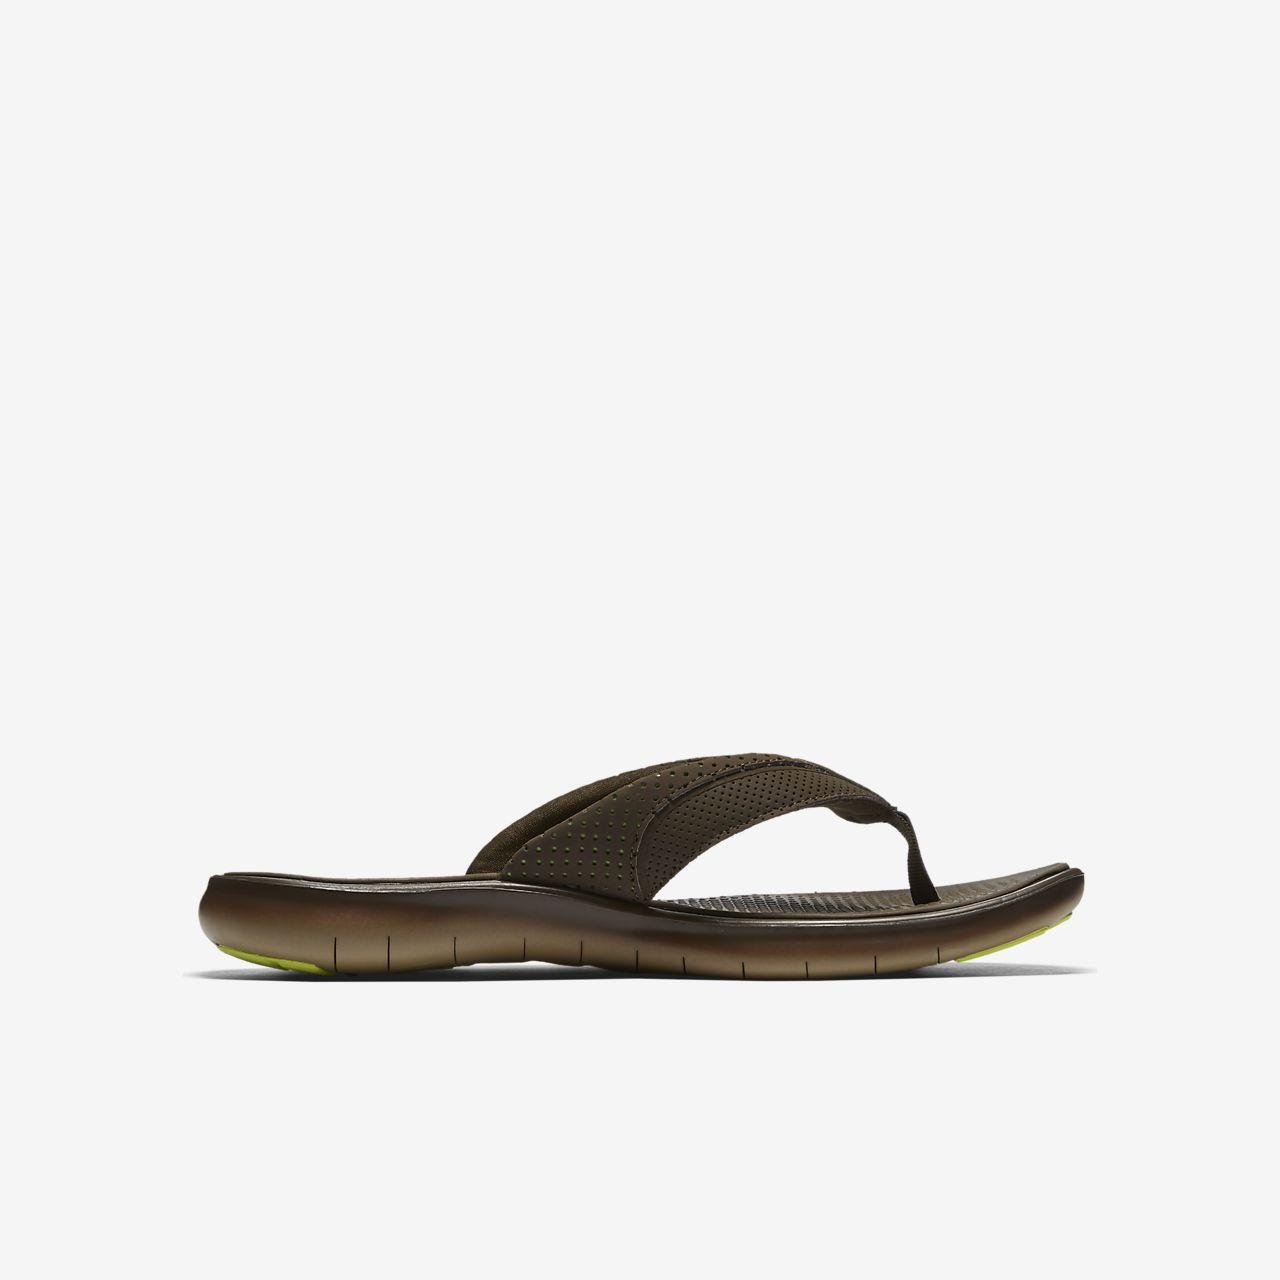 c5712a6ffdb6 Hurley Phantom Free Motion Men s Sandal. Nike.com ZA